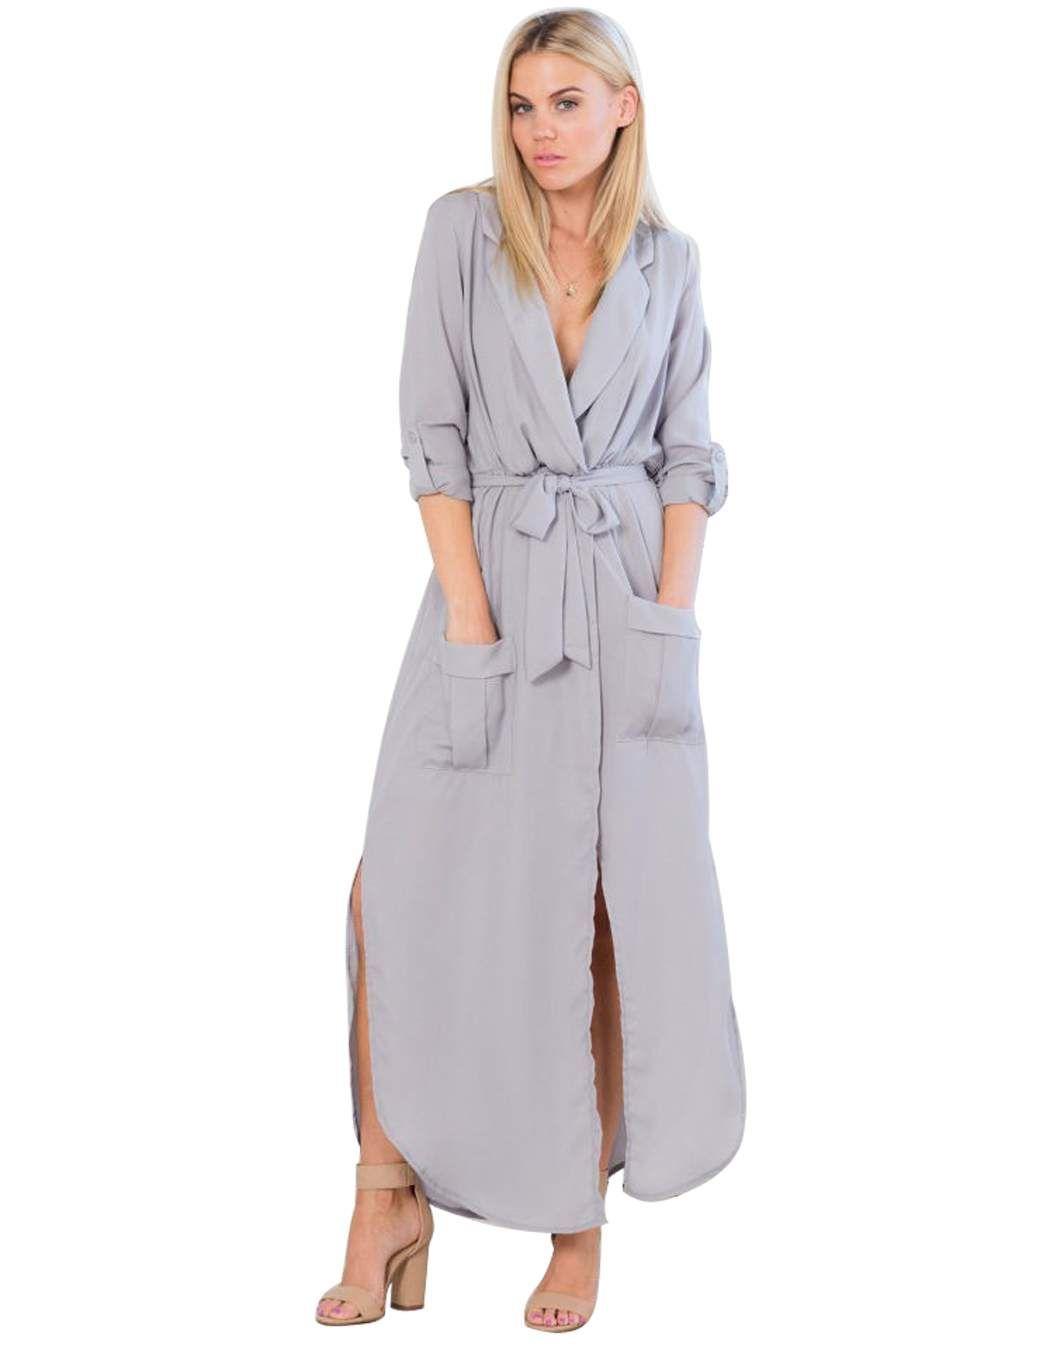 02558422ec2 Zeagoo Women s Sexy Long Sleeve Side Split V Neck Long Chiffon Shirt Dress  With Belt